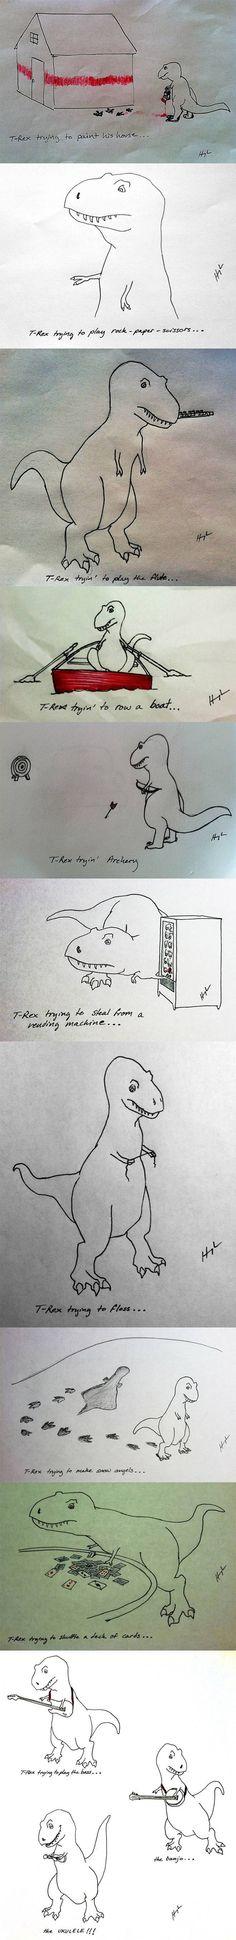 T-rex Has Had Some Hard Life